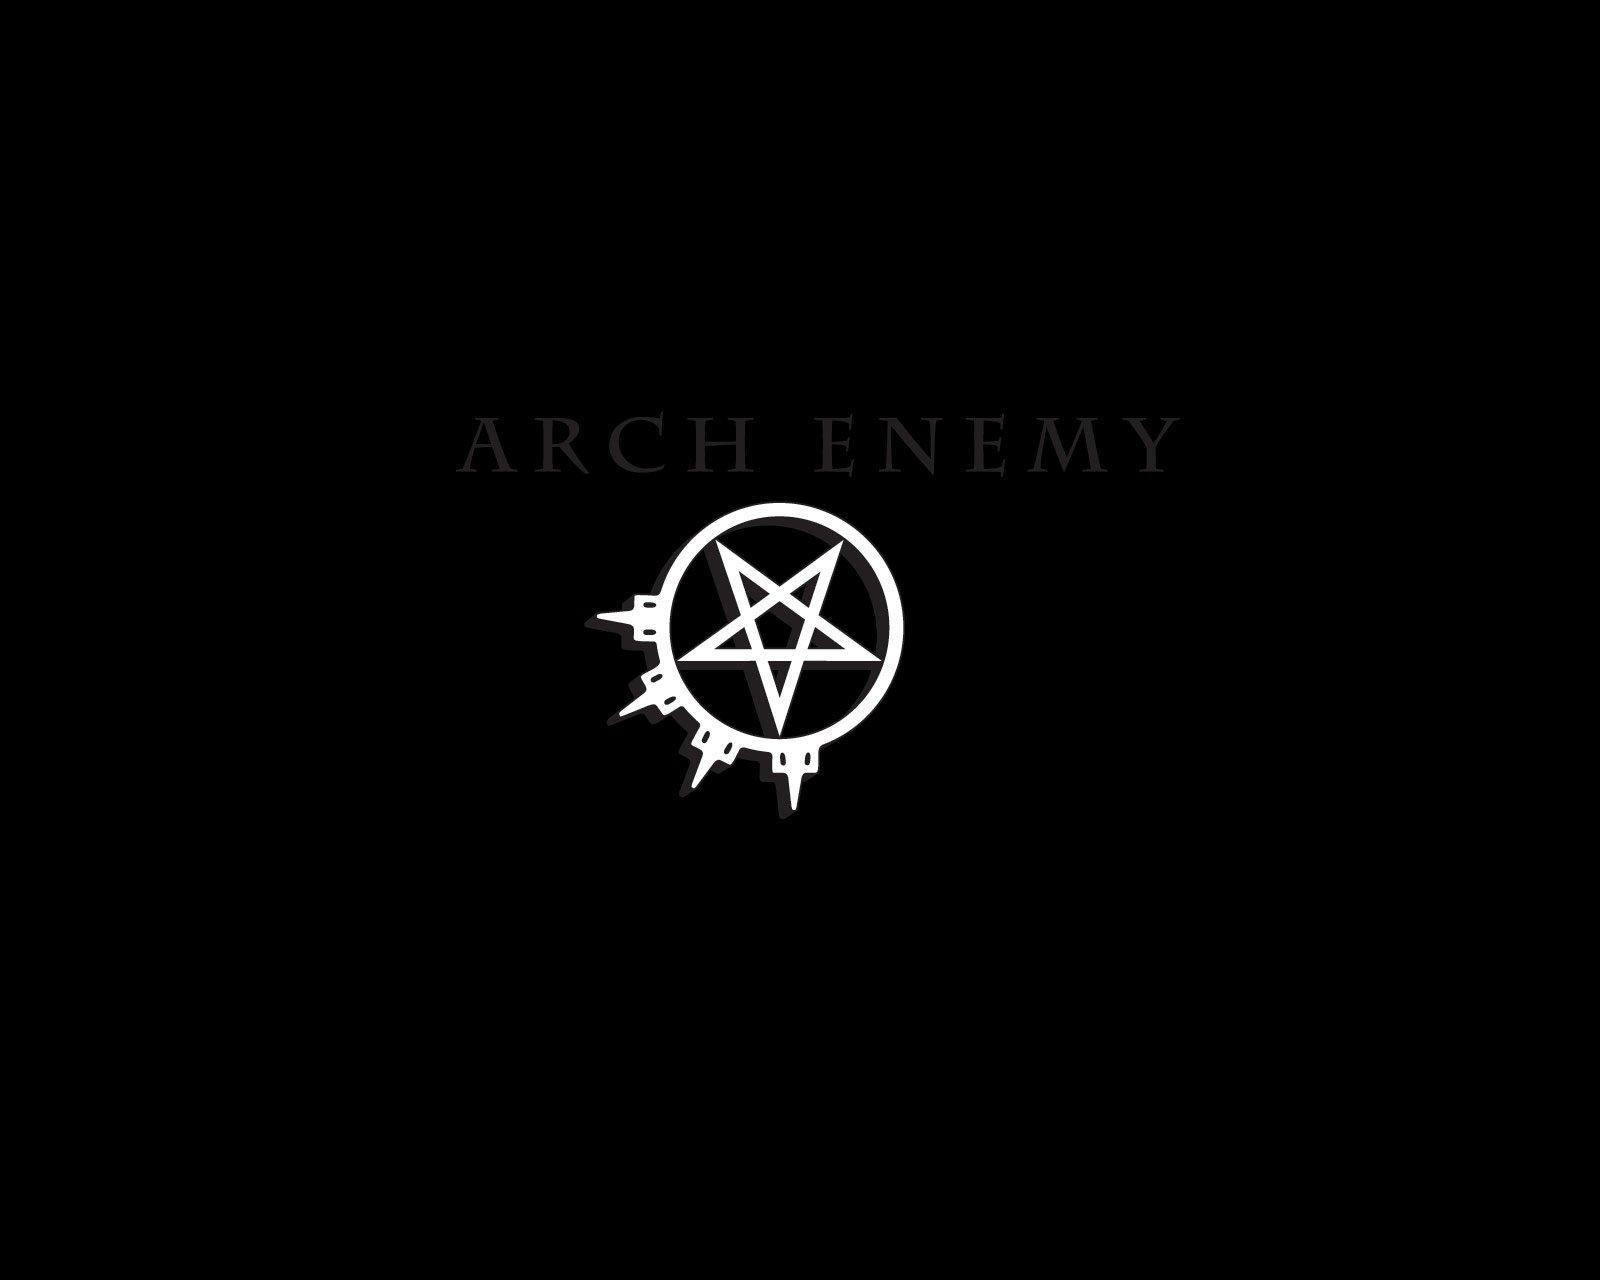 Arch Enemy Fondo De Pantalla And Fondo De Escritorio